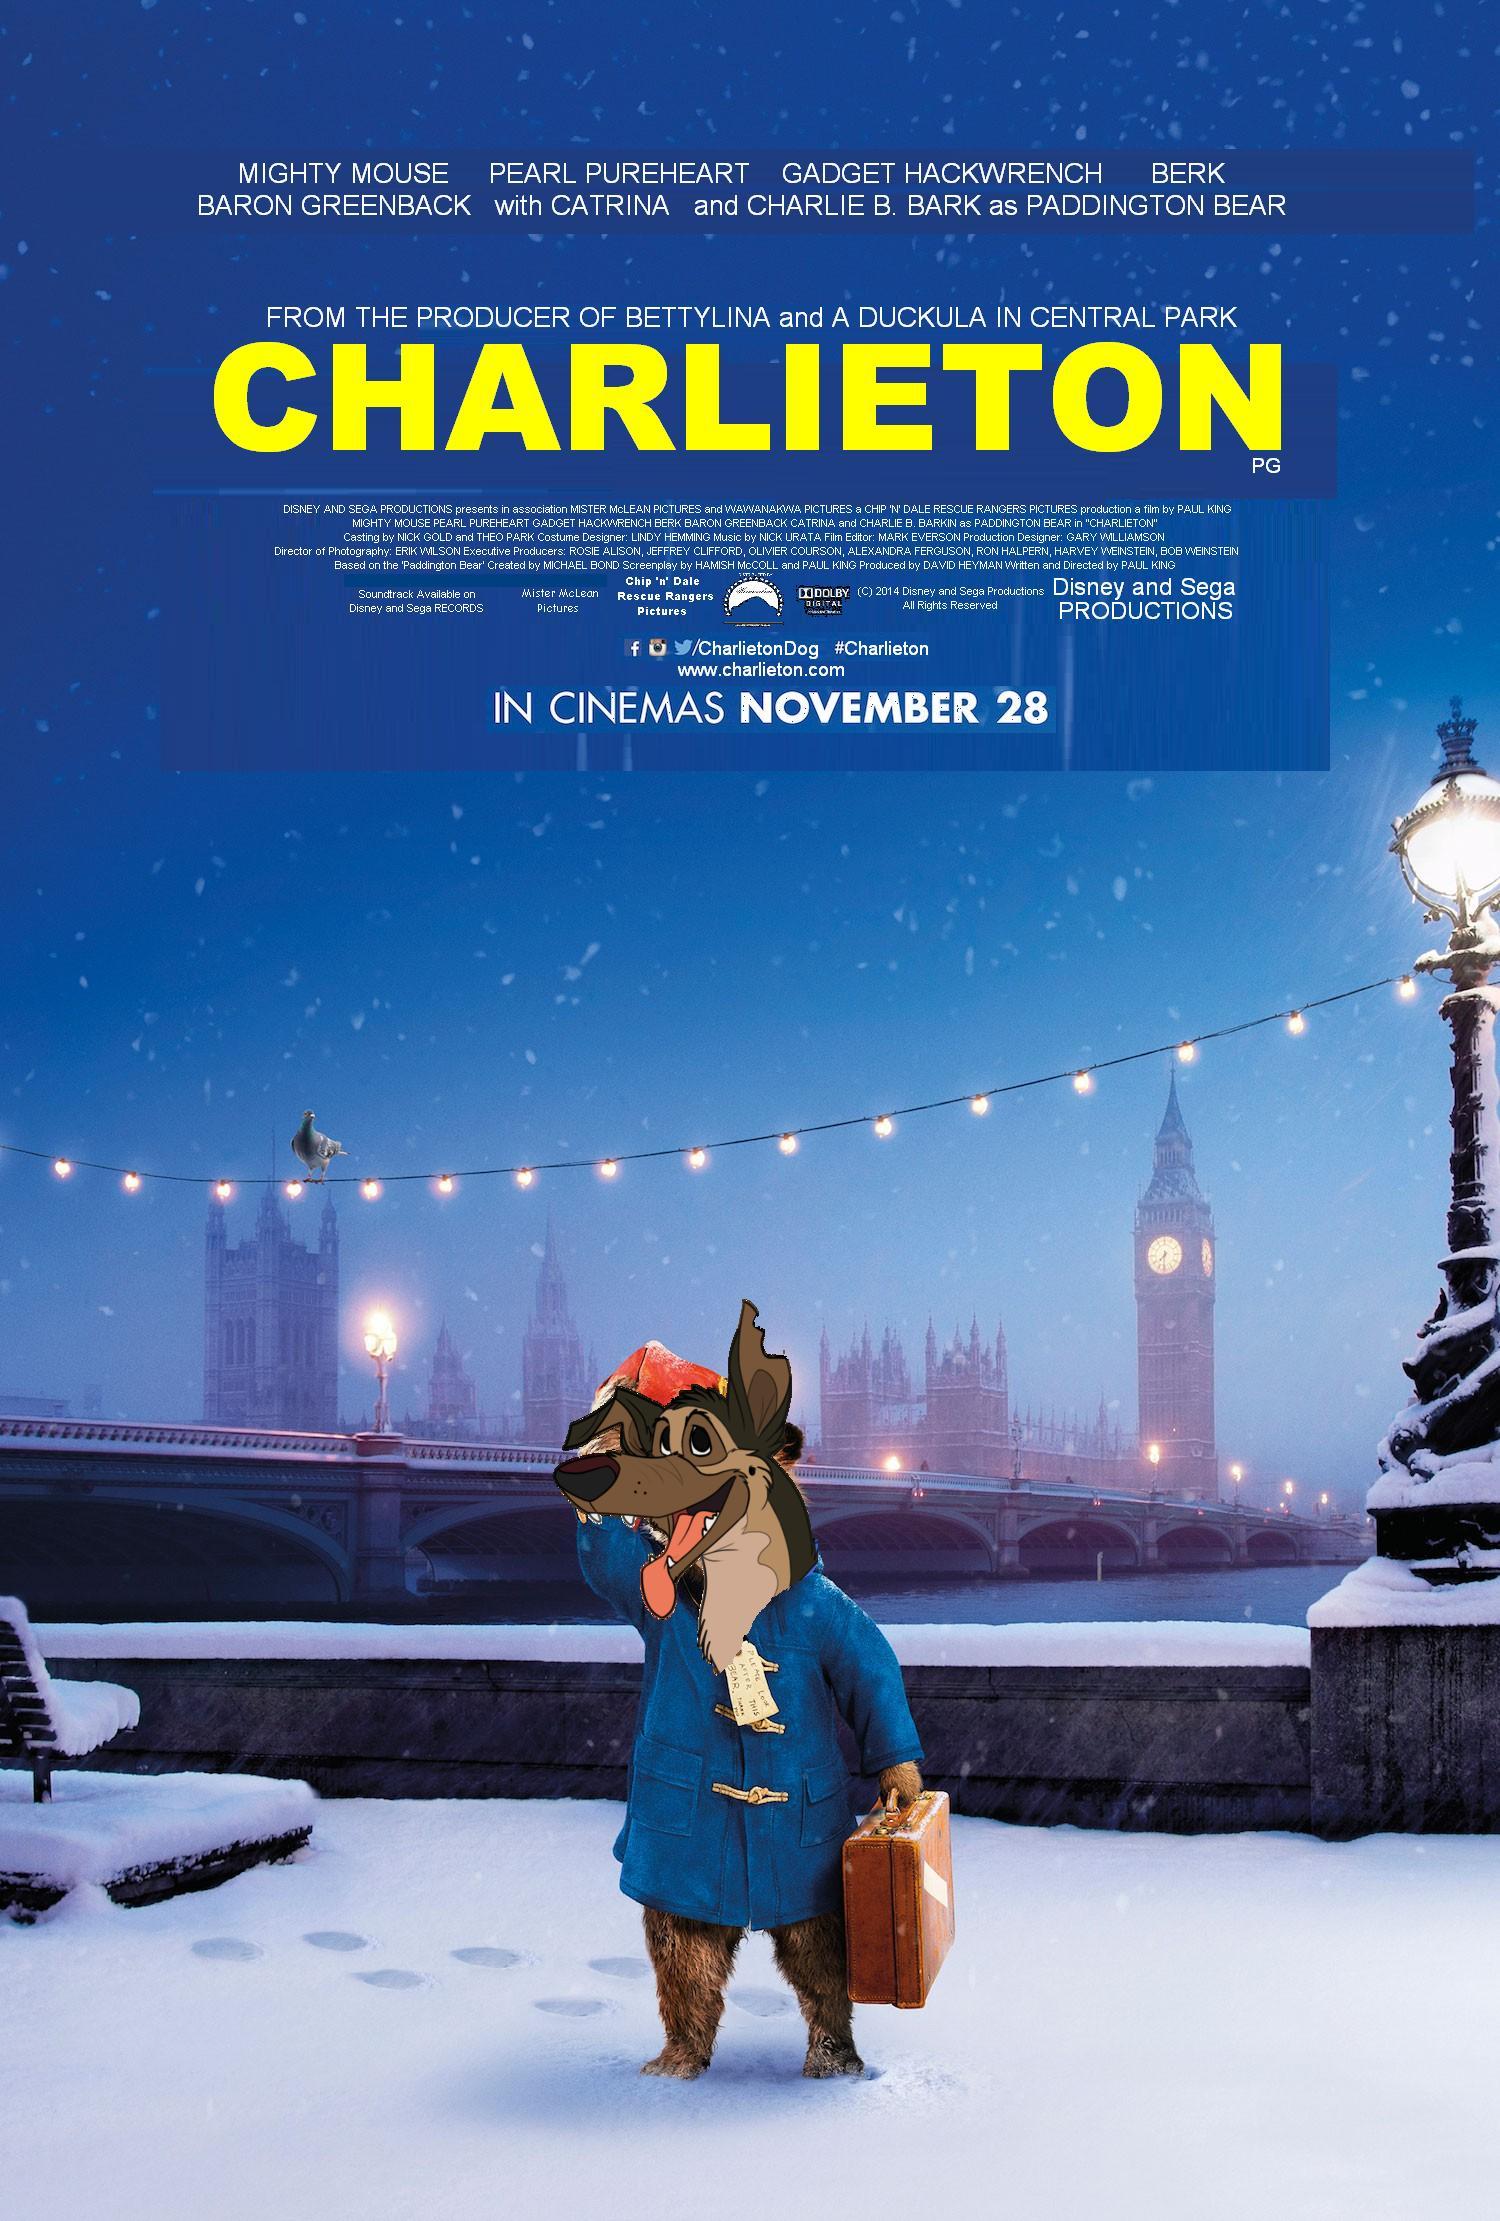 Charlieton